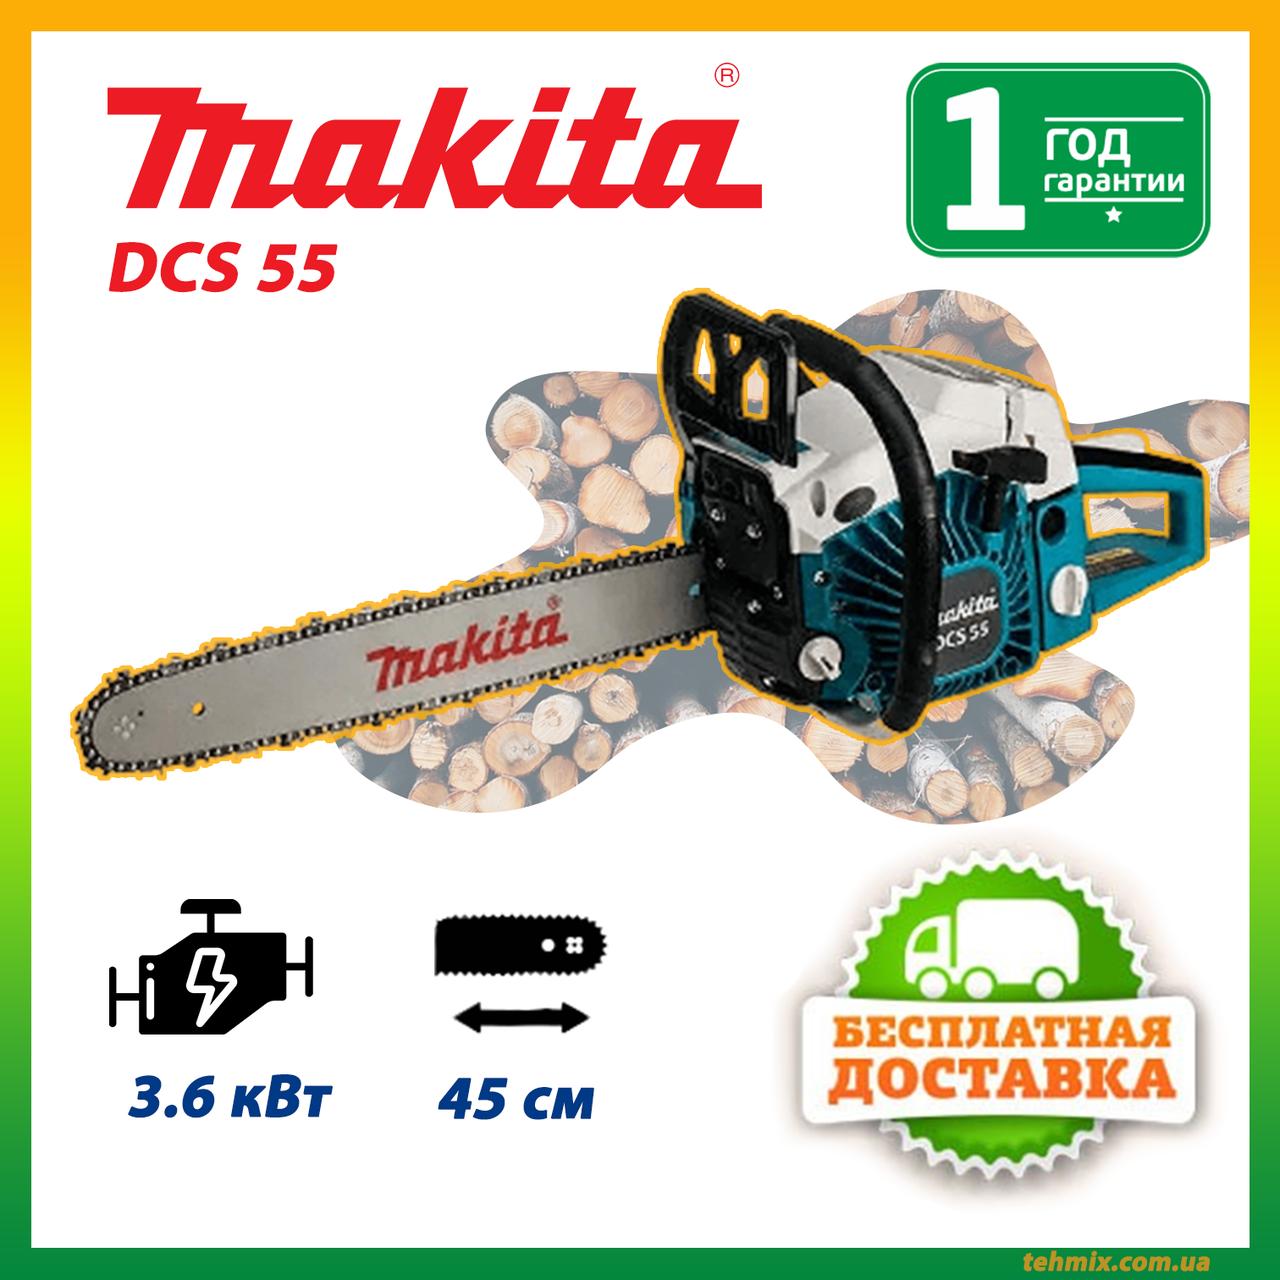 Бензопила Makita DCS 55 (шина 45 см, 3.6 кВт) Цепная пила Макита Мотопила цепна Макіта